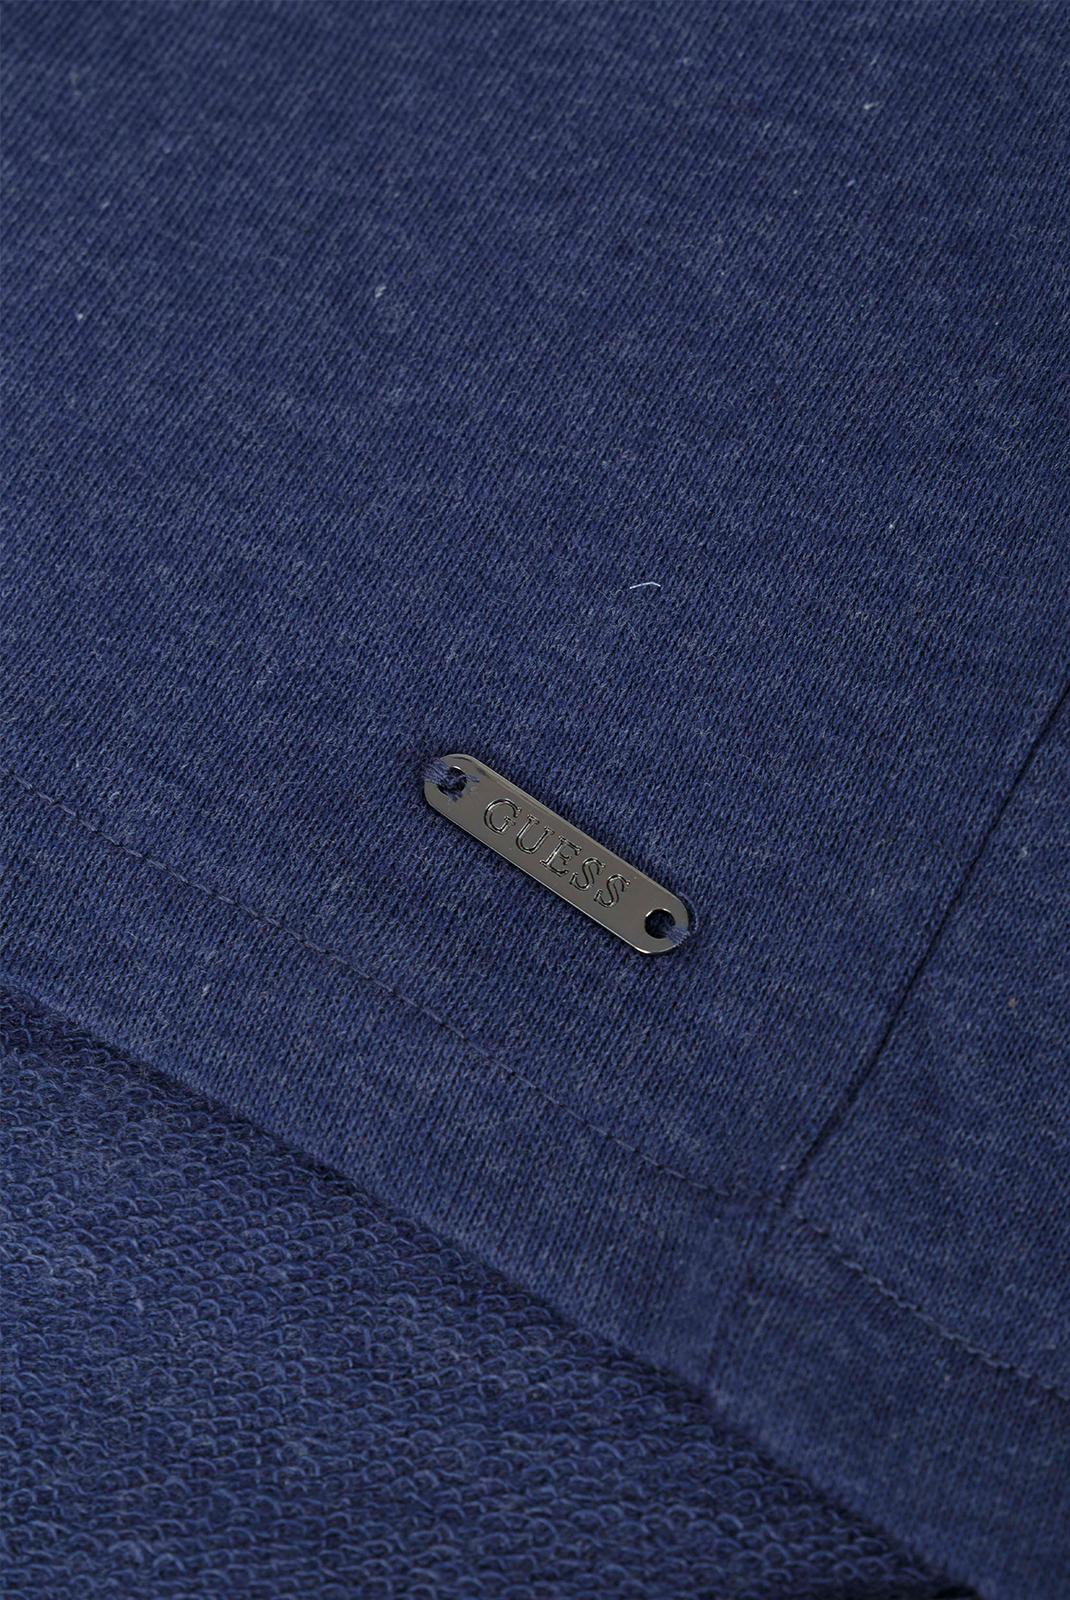 Pull  Guess jeans O72Q05FL008 C765 BLUE